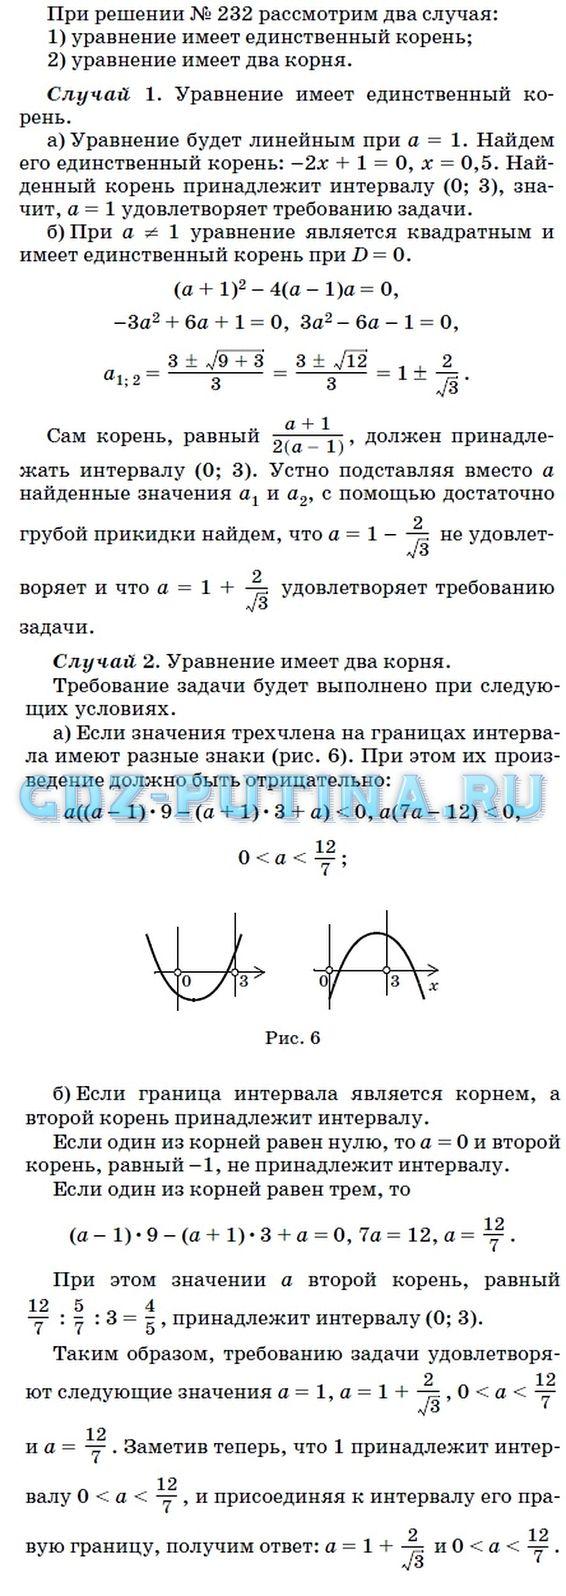 Гдз По Учебнику По Алгебре За 9 Класс Муравин Г.к